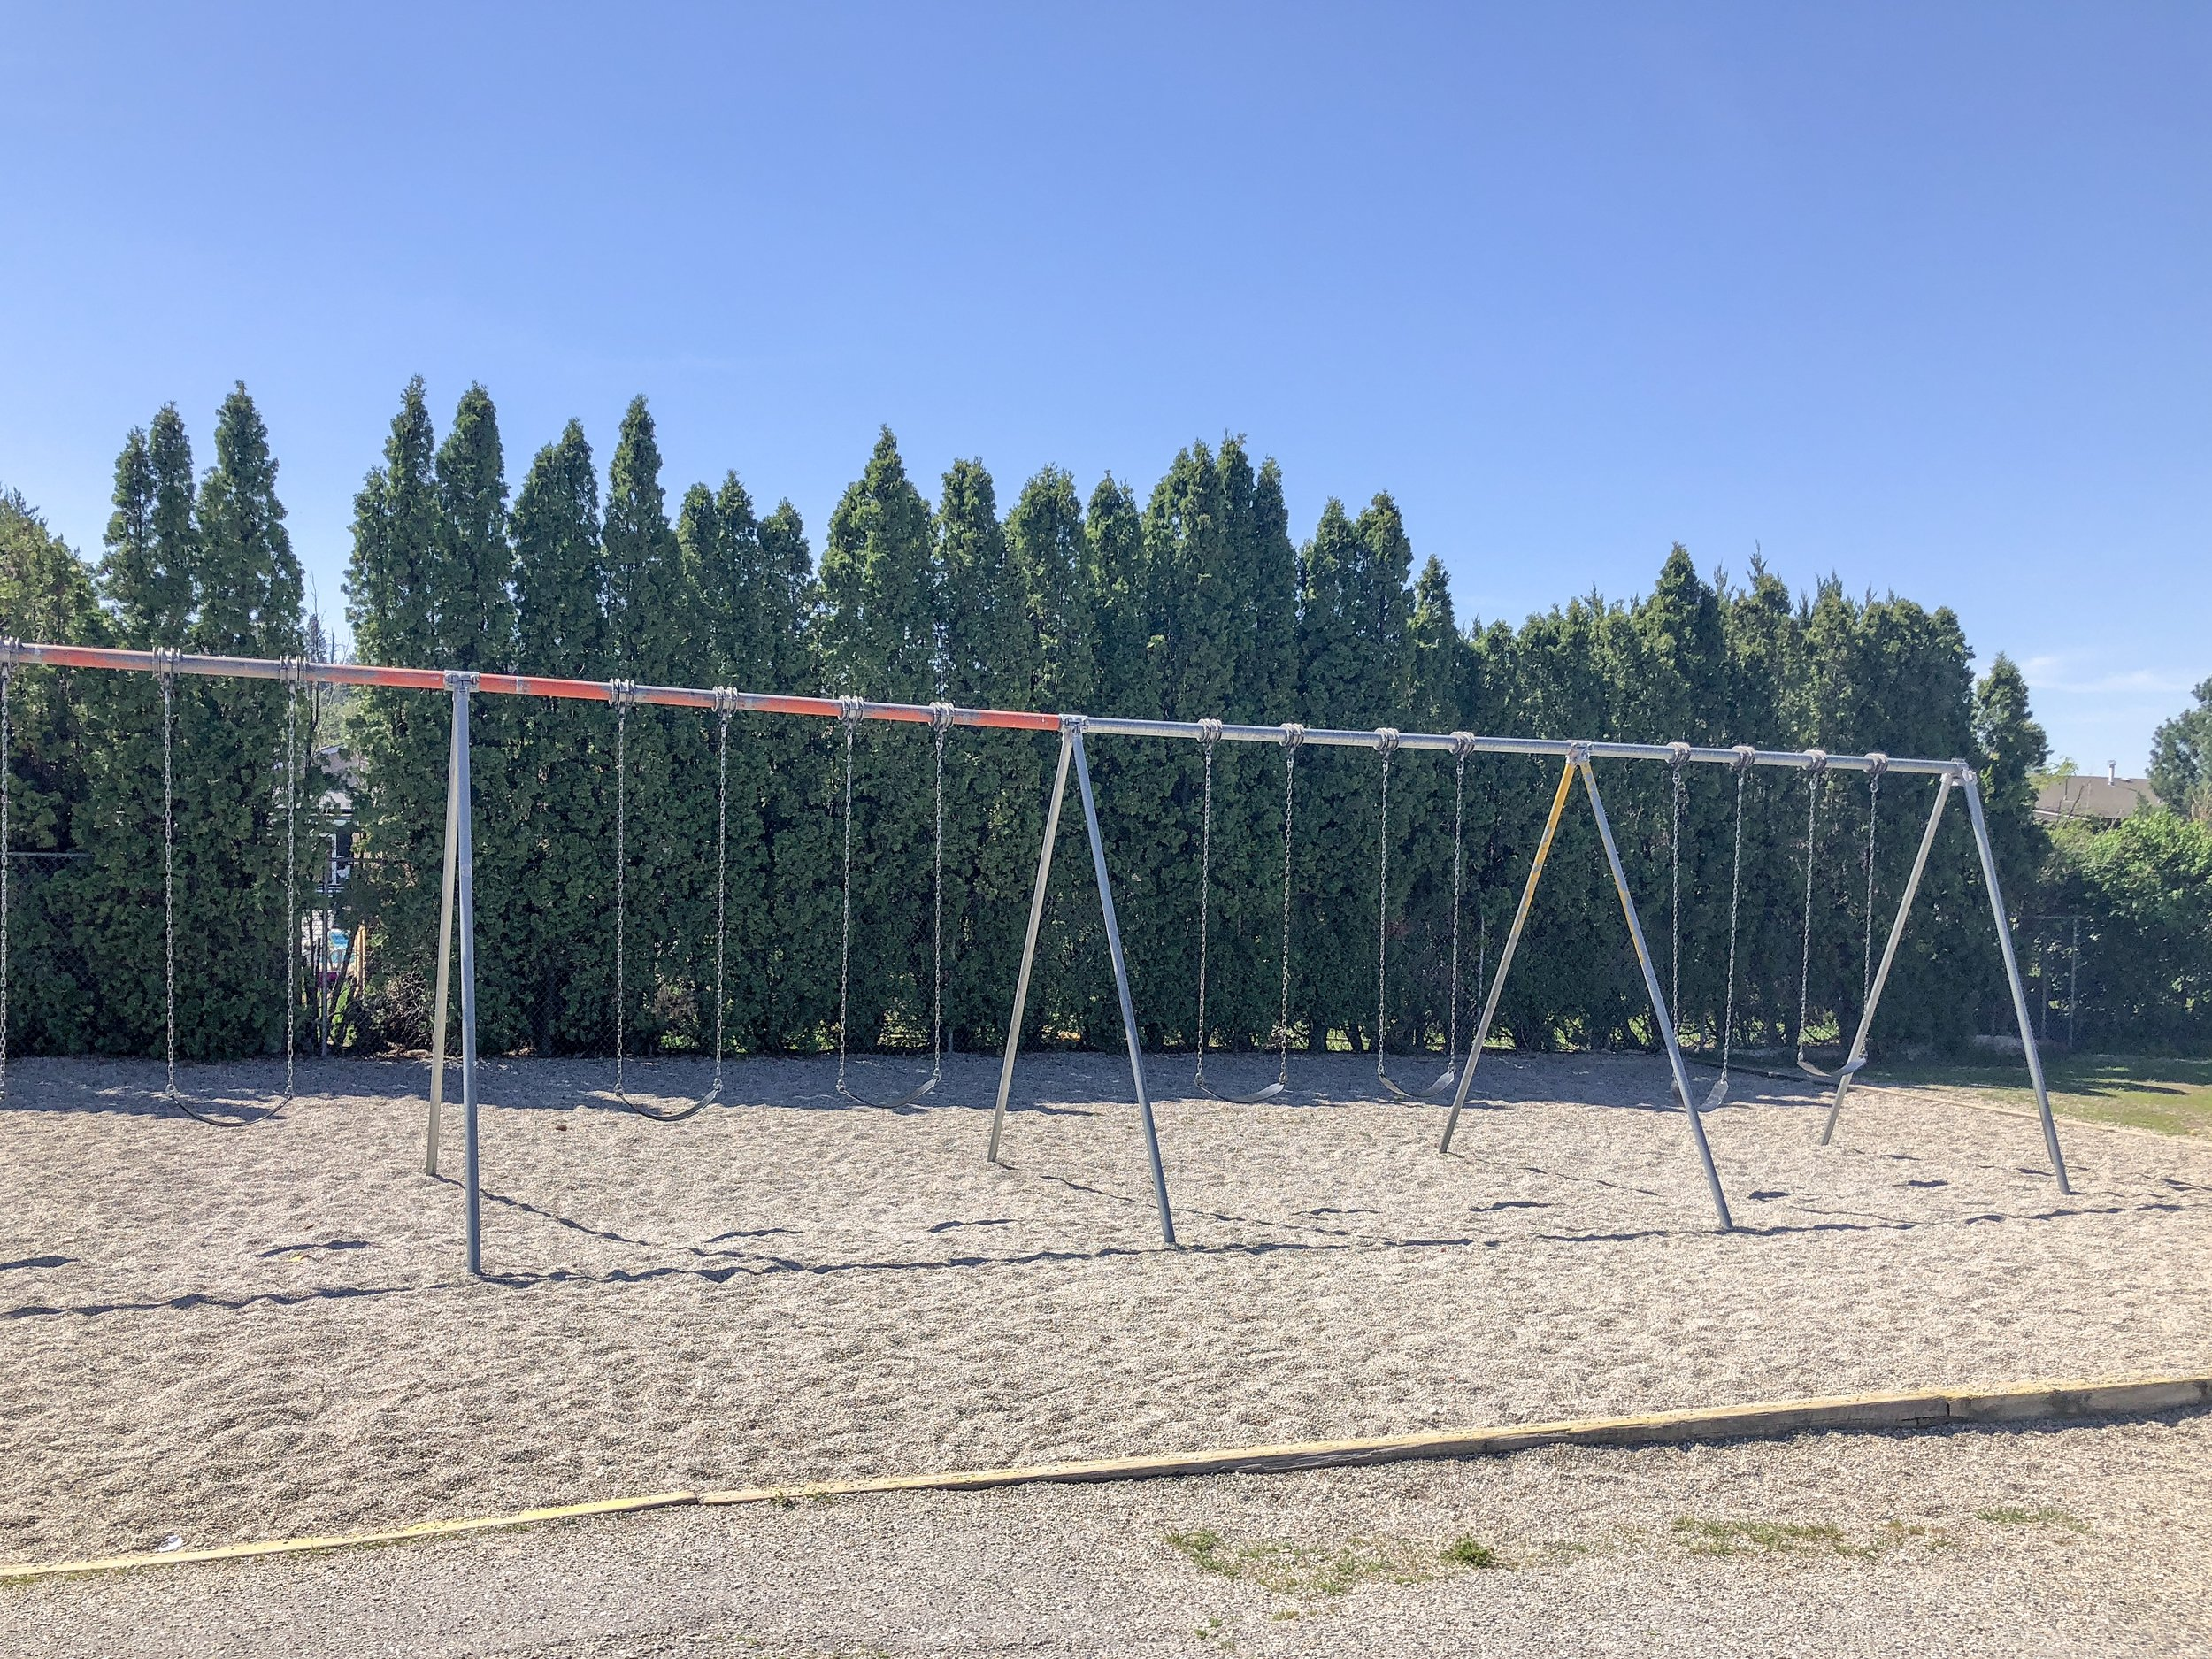 springvalley-elementary-school-rutland-neighbourhood-kelowna-joshua-elliott-03.jpg